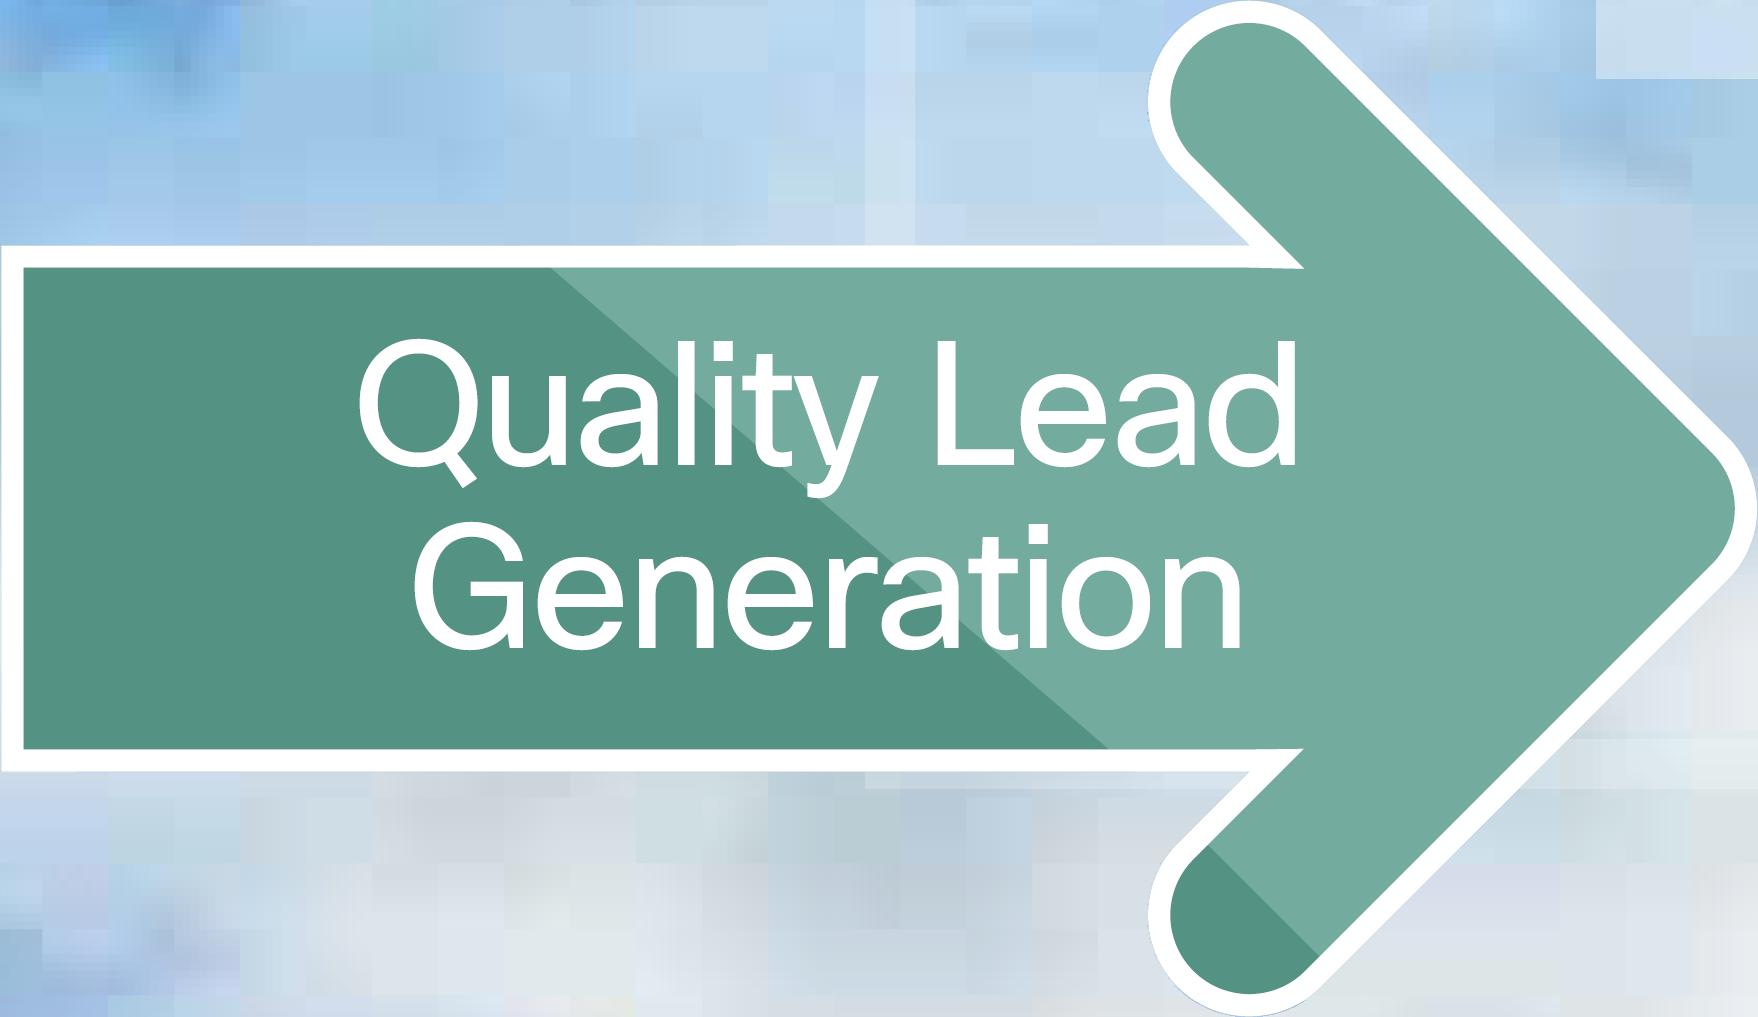 Quality Lead Generation